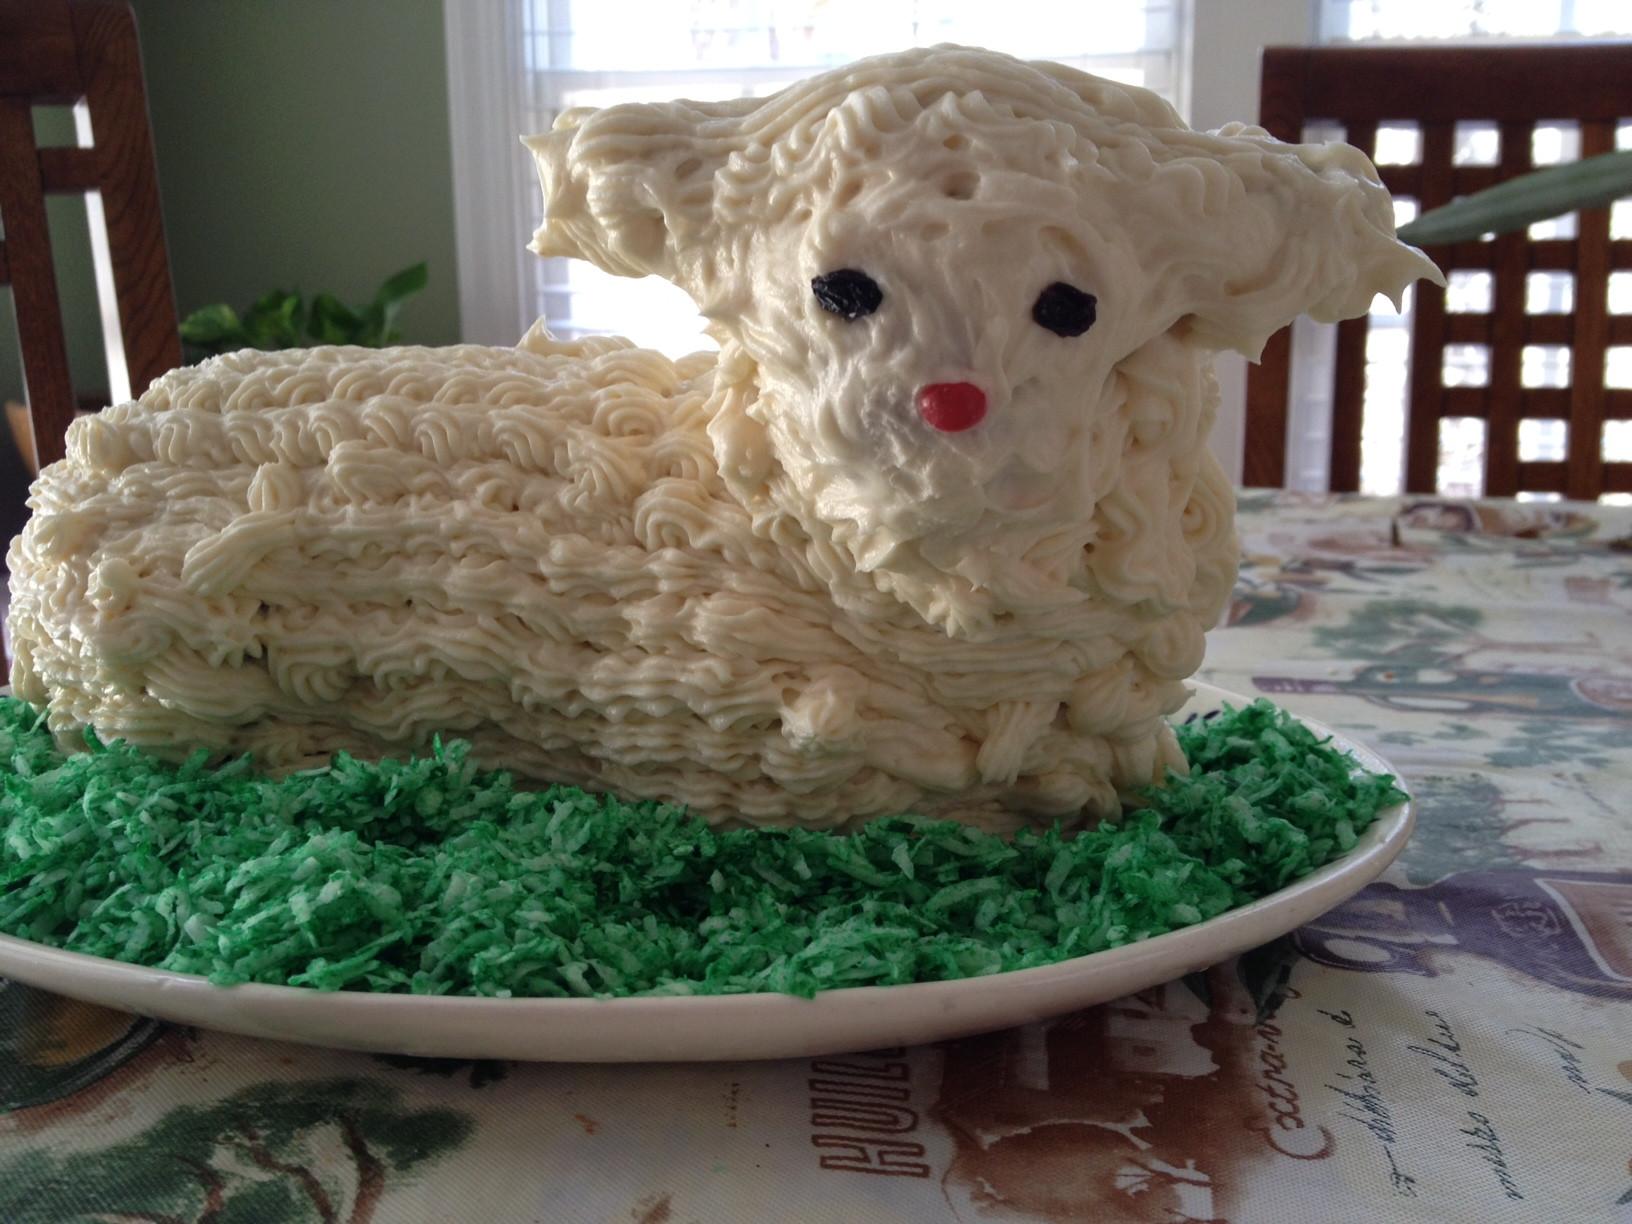 Lamb For Easter  Easter Lamb Cake Recipe — Dishmaps